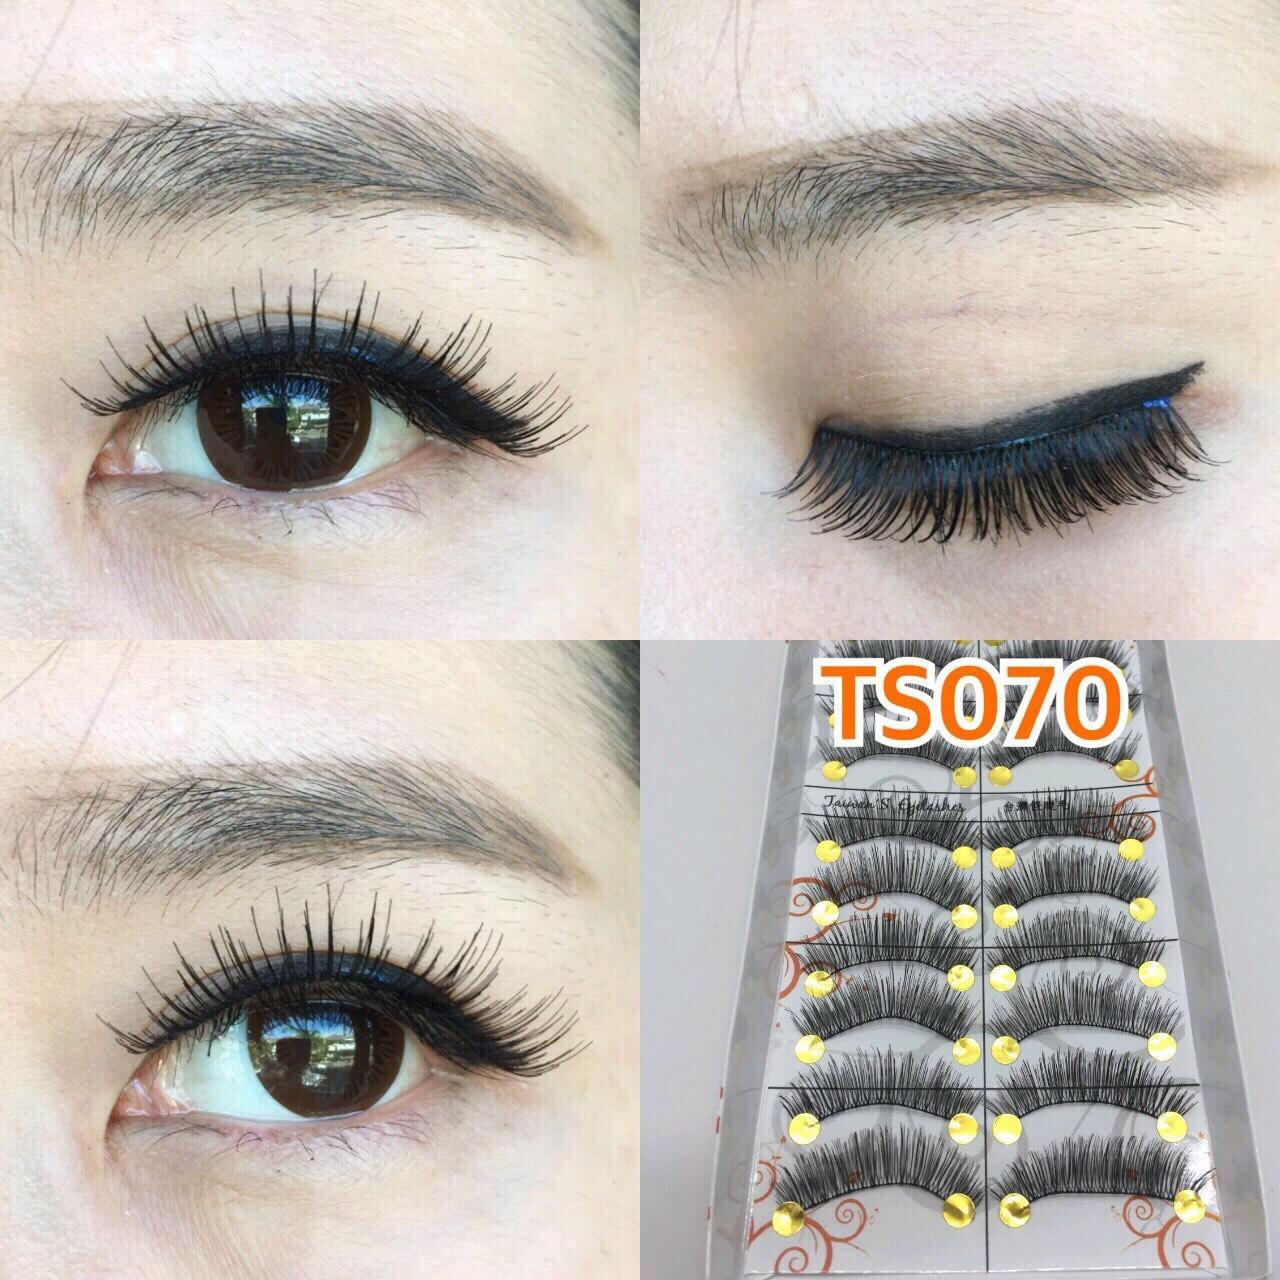 Kelebihan Bulu Mata Taiwan Eyelashes 10 Pairs Bulumata Palsu 217 Flase Eyelash Handmade Ts070 Pasang